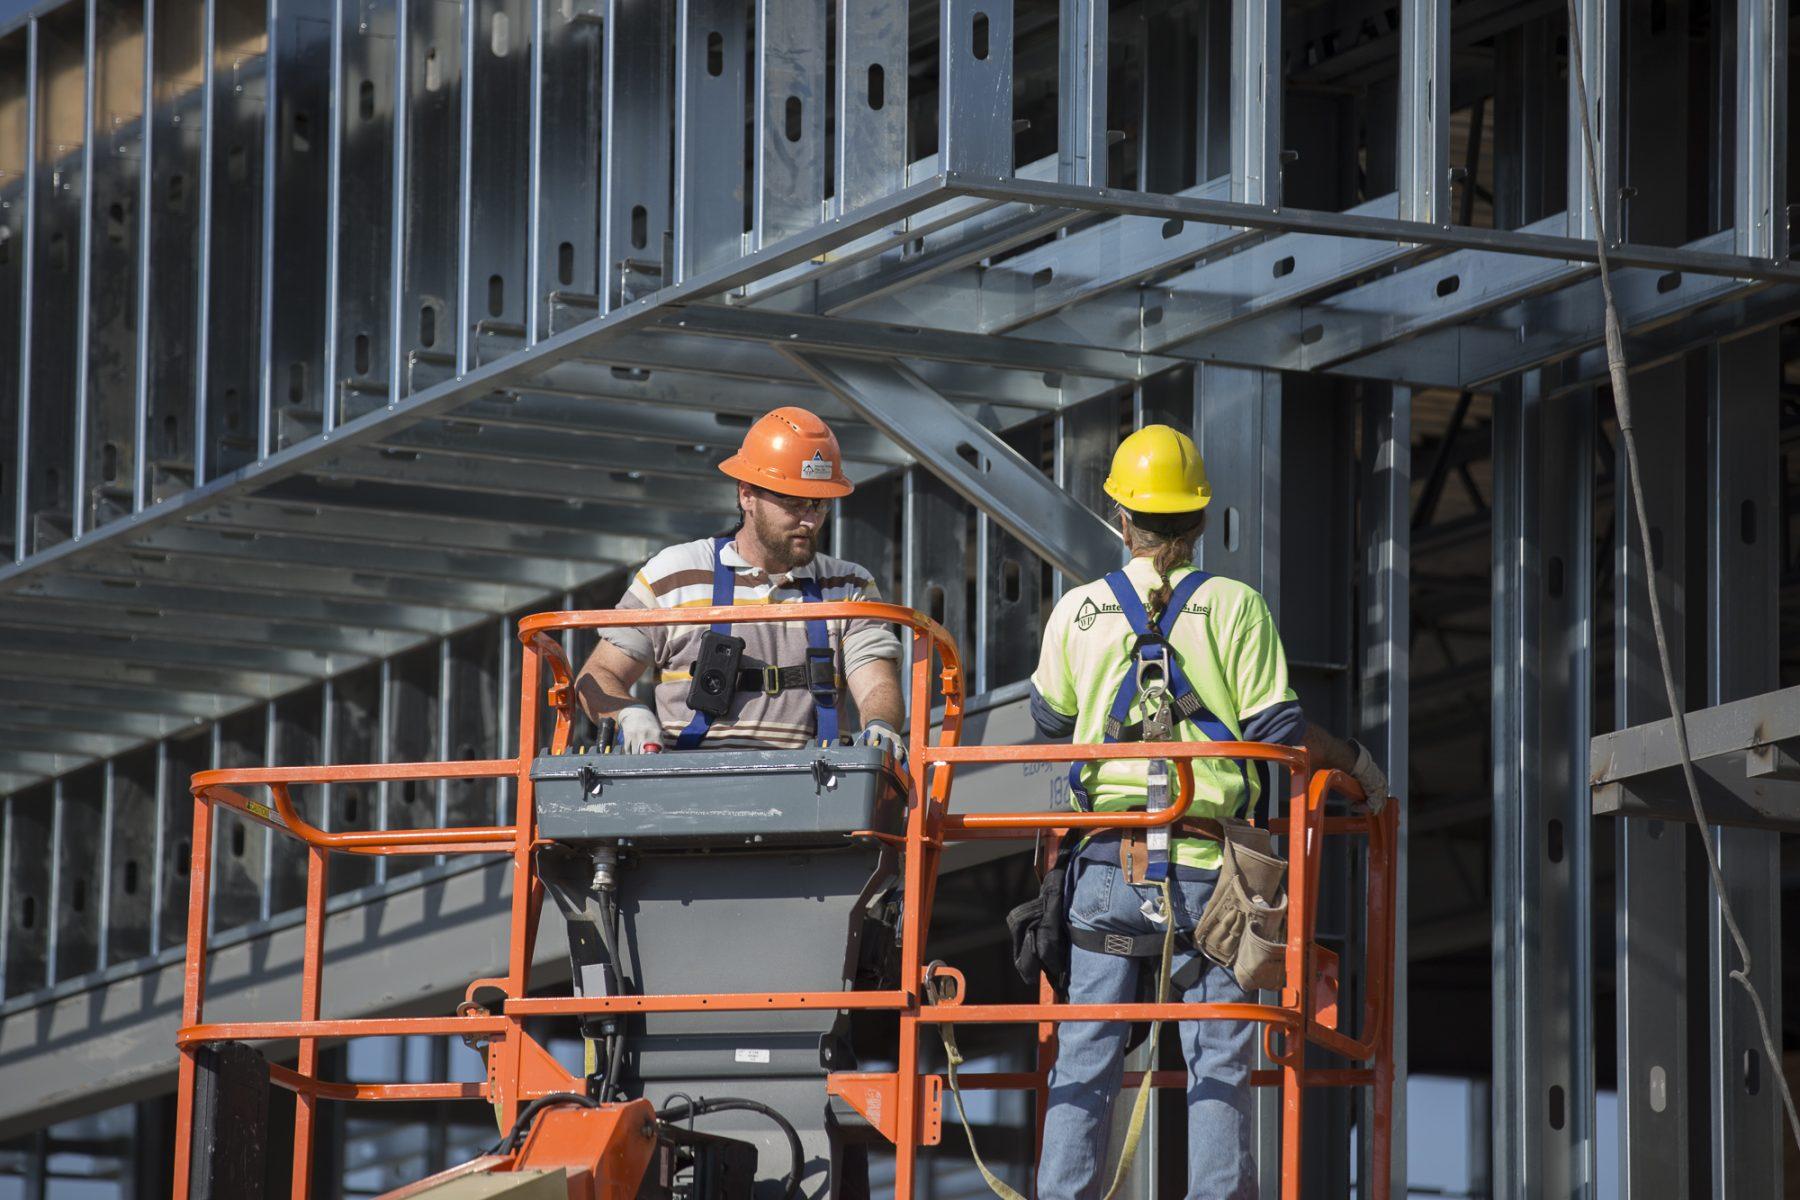 Tom-Wood-Lexus-Capitol-Construction-Web-Ready-68